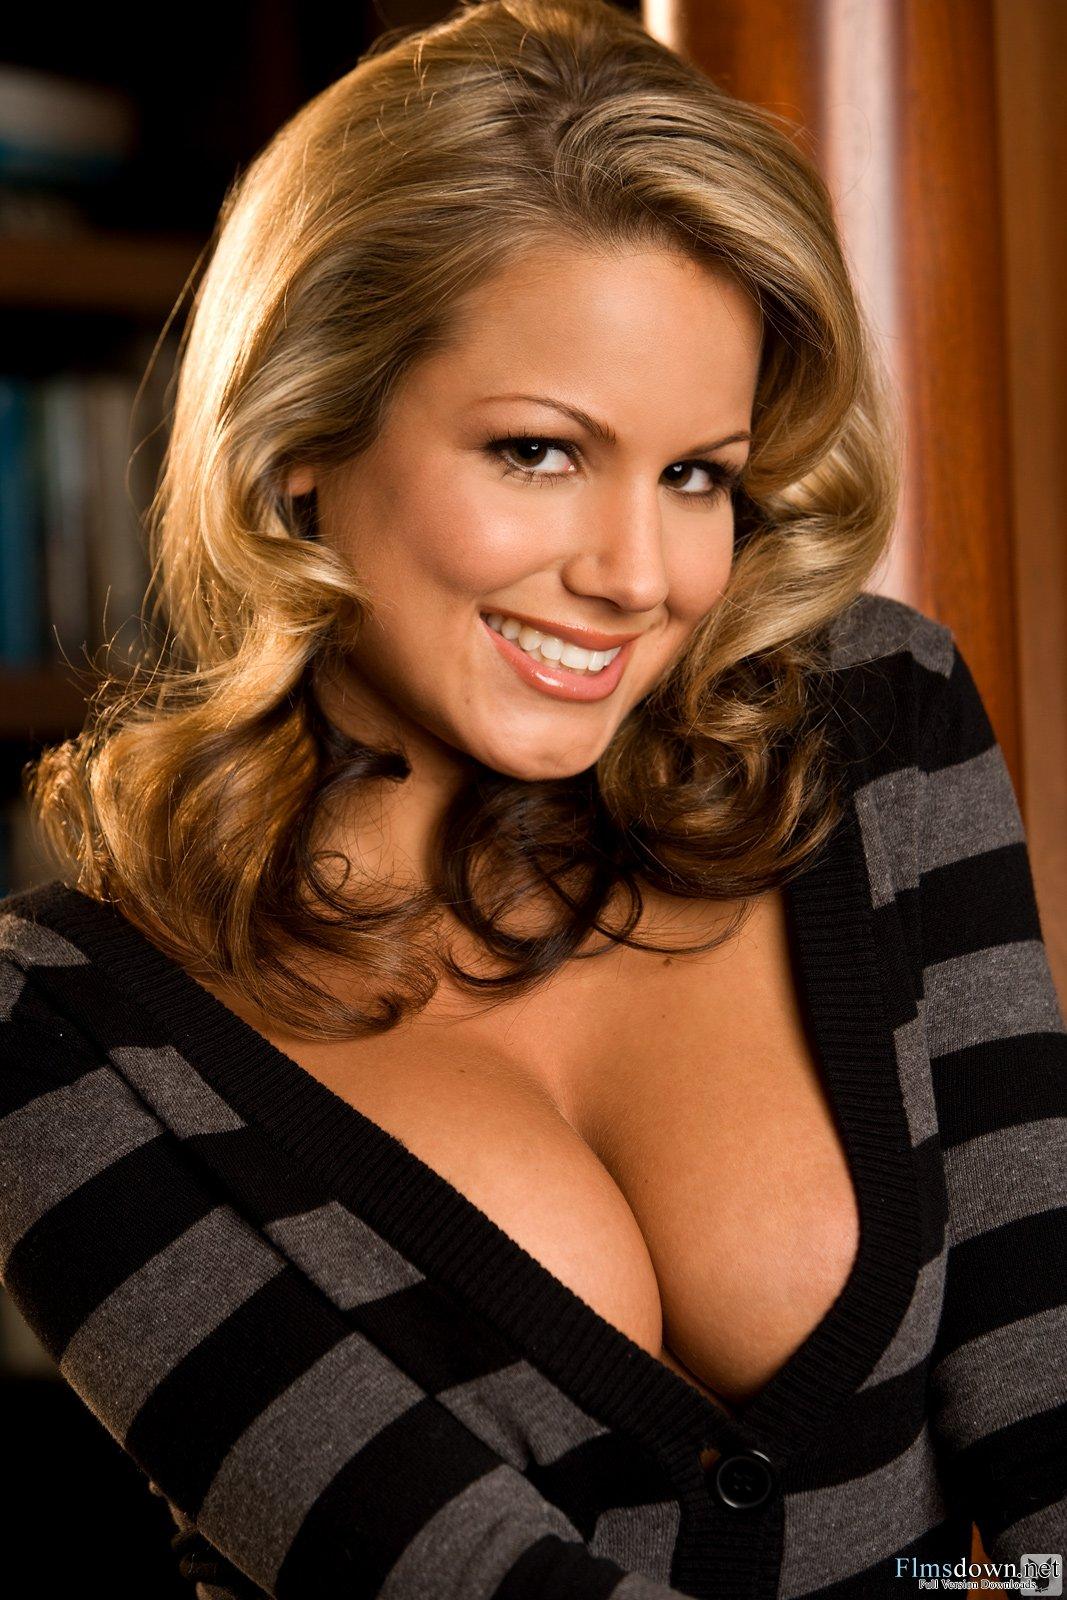 http://4.bp.blogspot.com/-IH_p-GN_5NI/TtfU5ex_P8I/AAAAAAAAMHY/GEqObmEKAk8/s1600/Jillian+Beyor+45.jpg